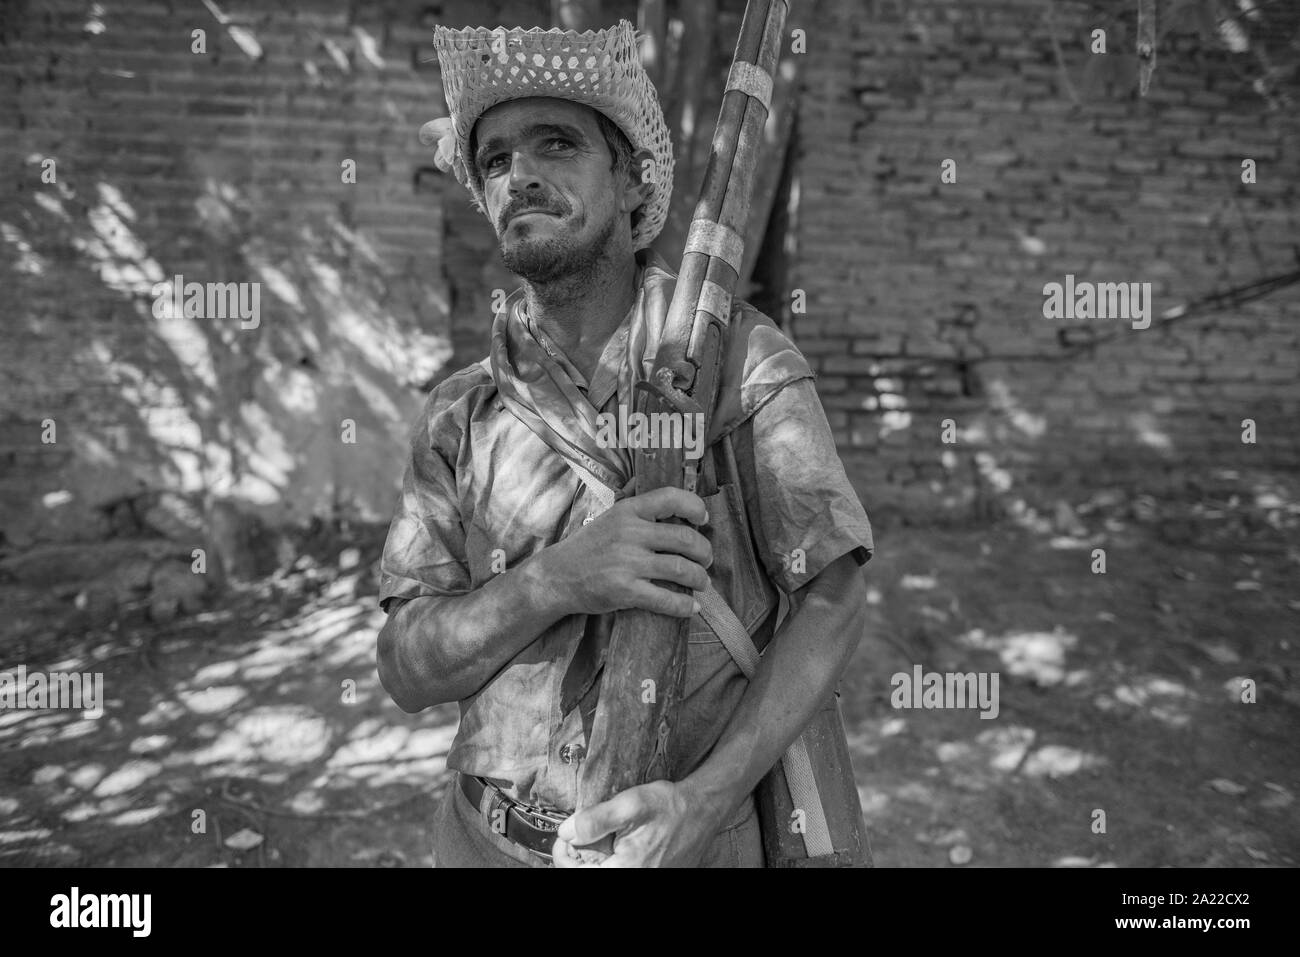 Man wearing costume of gunman during June festival in northeast Brazil Stock Photo